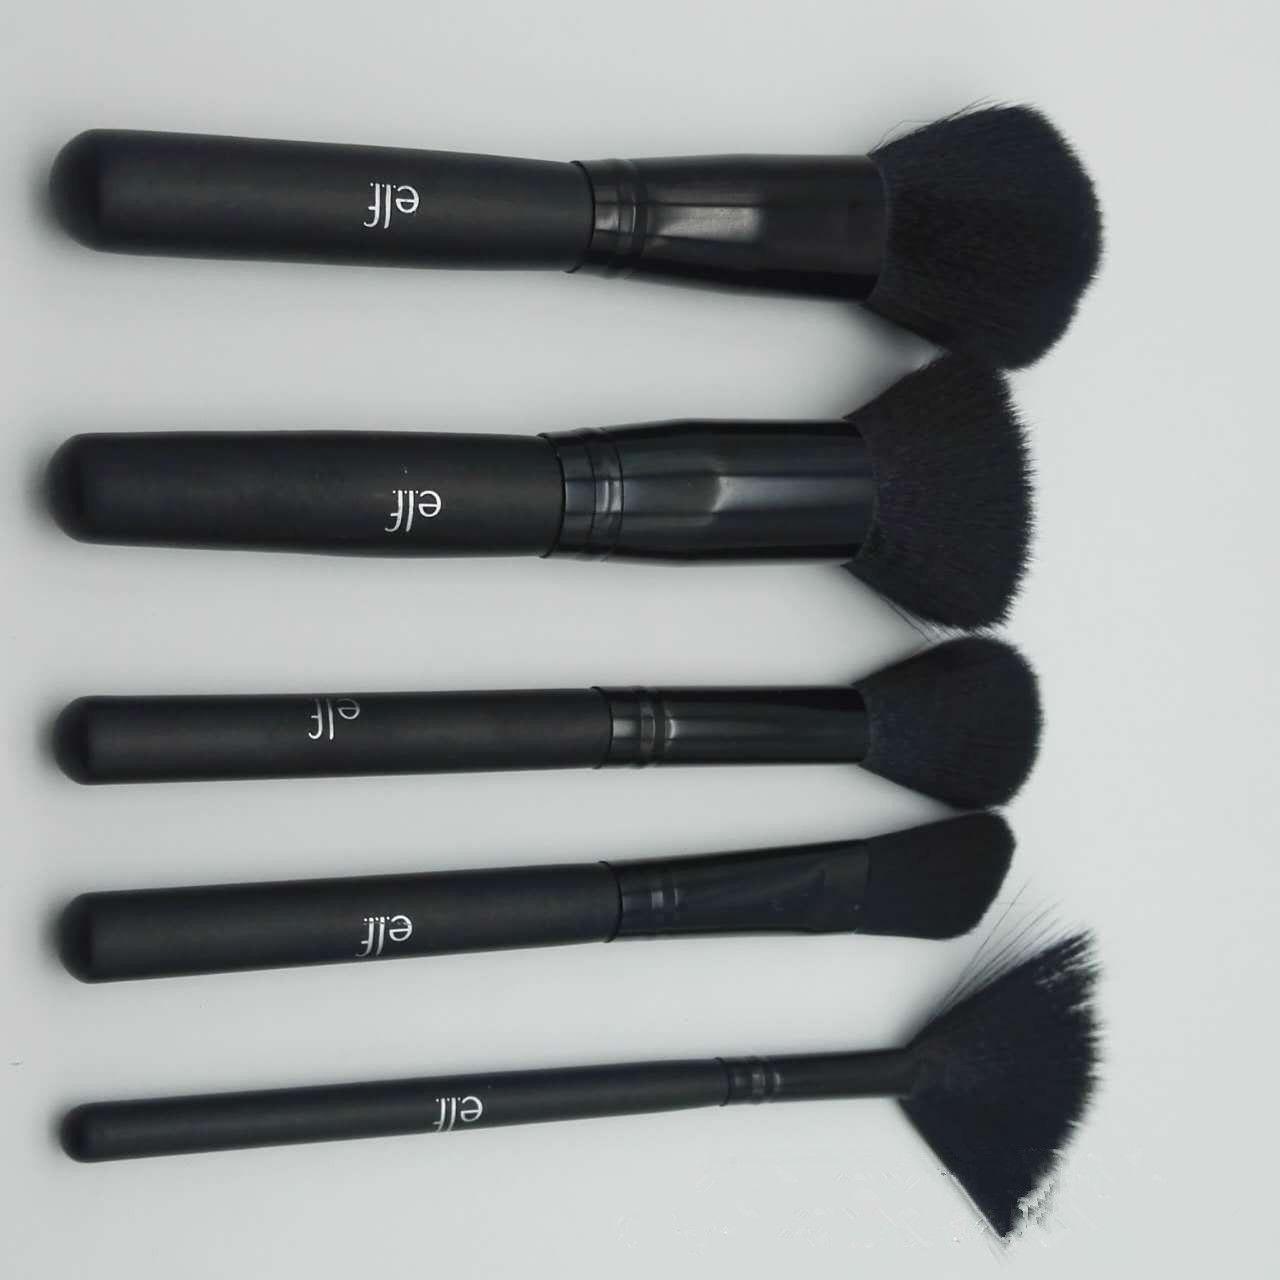 Black Makeup Brushes Set Face Power Eyeshadow Foundation Brush Multipurpose Beauty Cosmetic Tool Make Up Brush Sets with Box